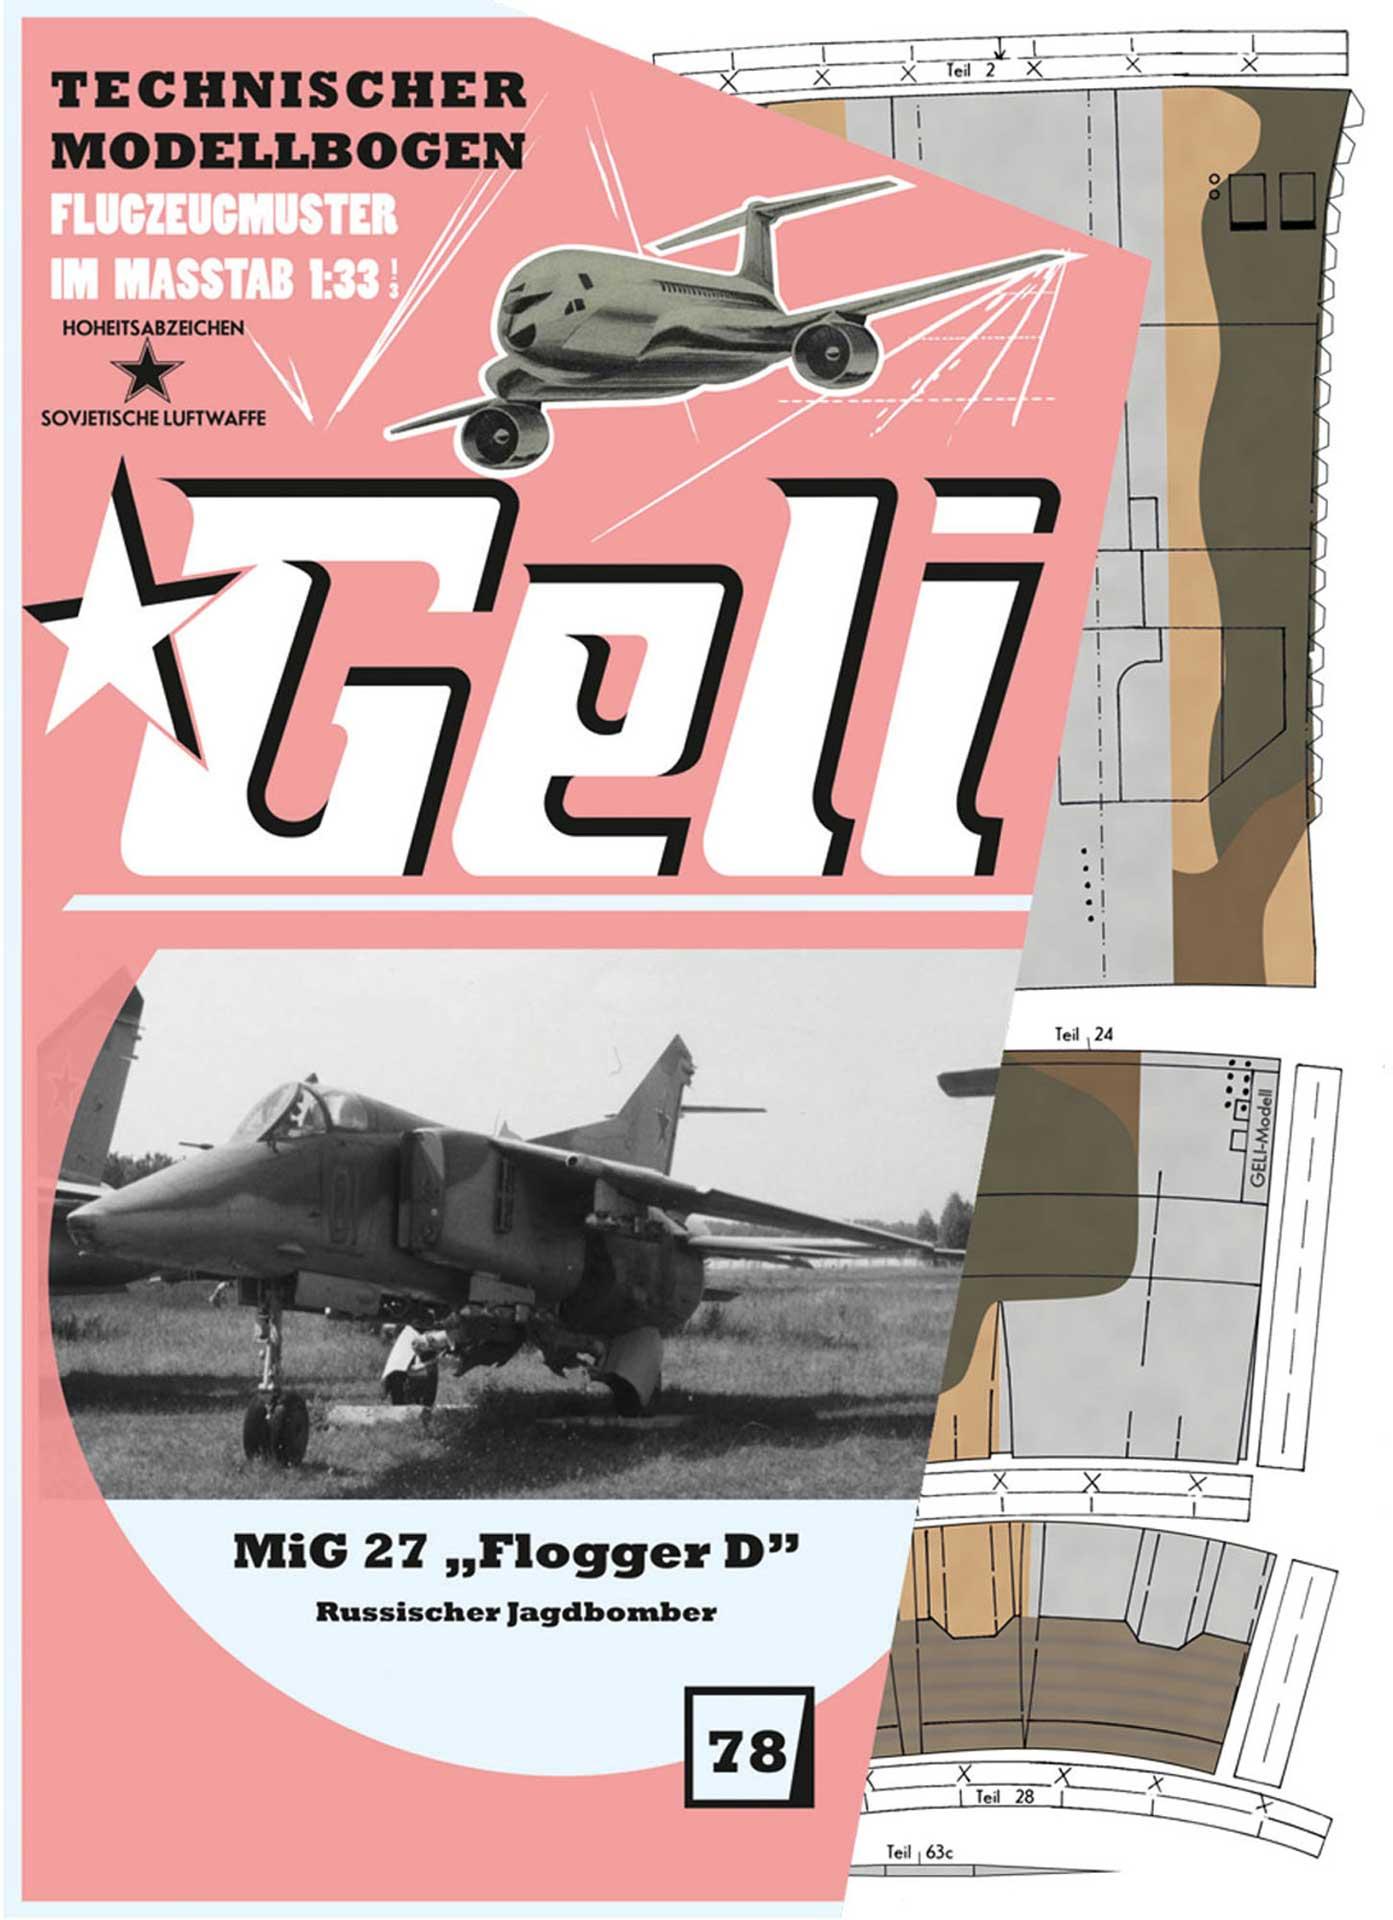 GELI MIG-27 # 78 KARTONMODELL